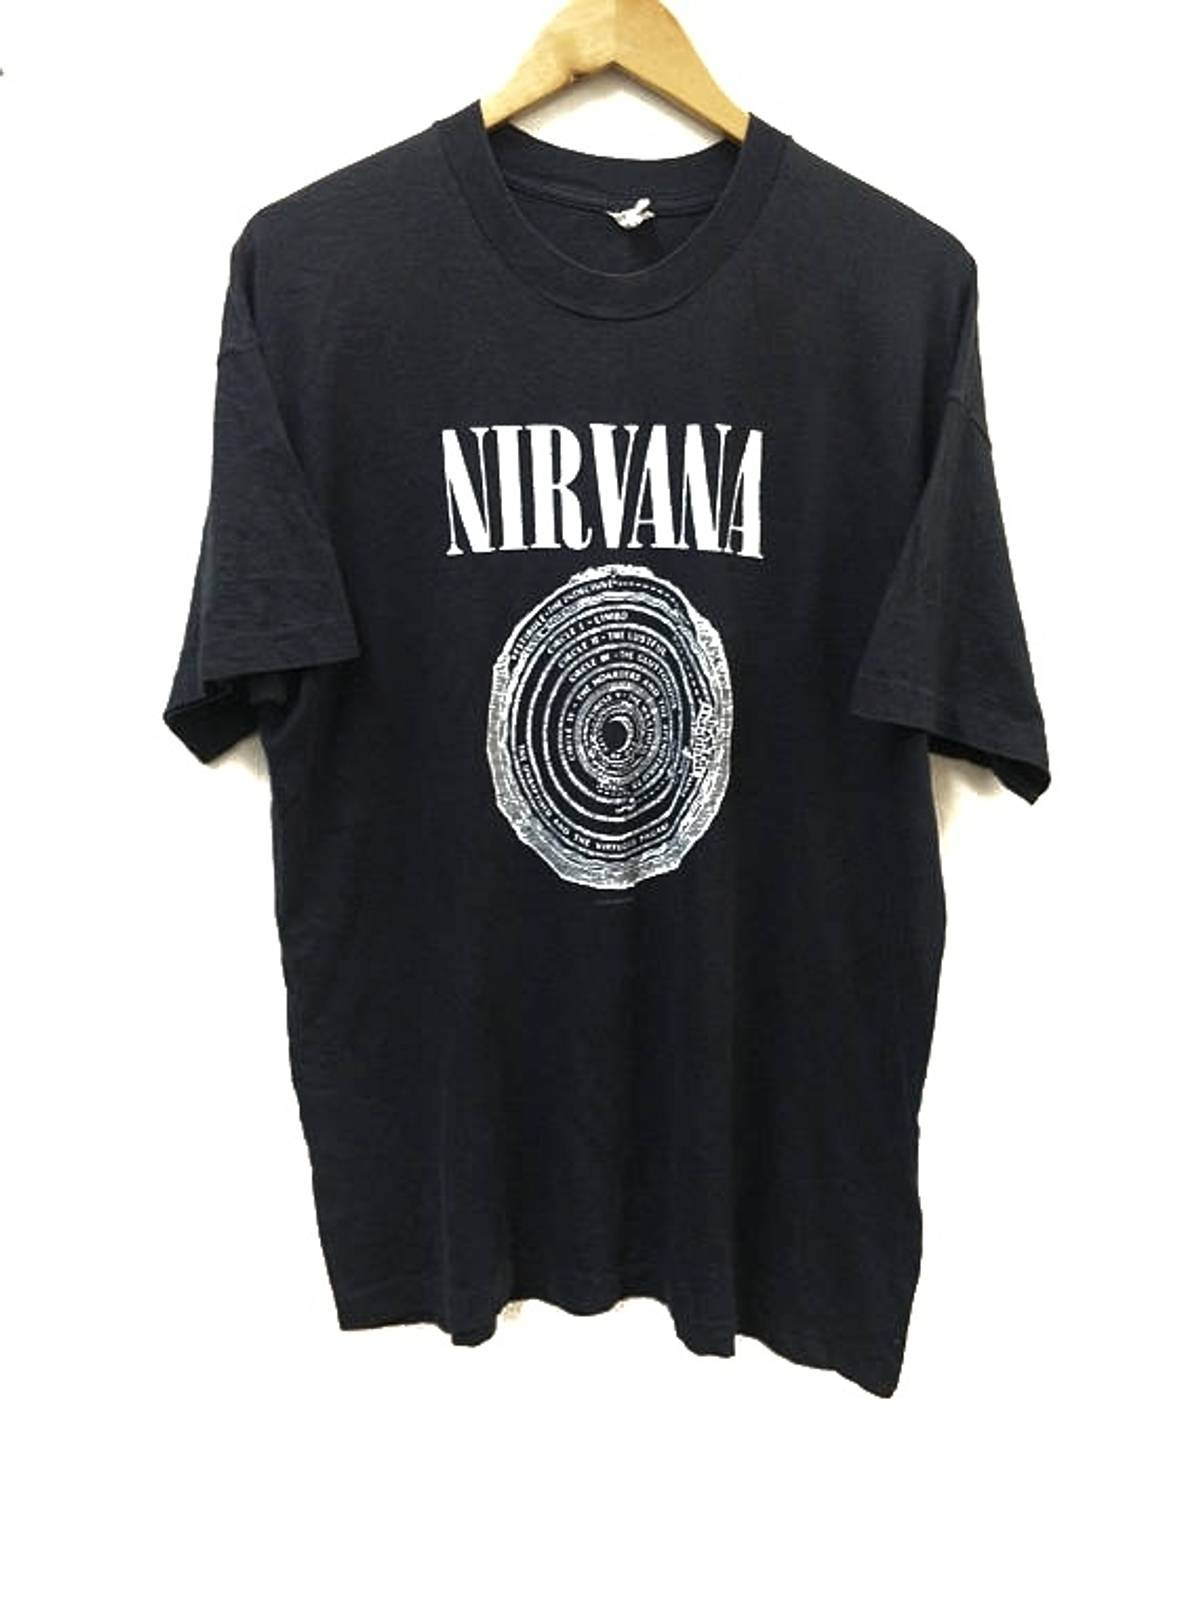 RARE Vintage 1992 Nirvana Original Tour T Shirt Smiley Face SAMbA